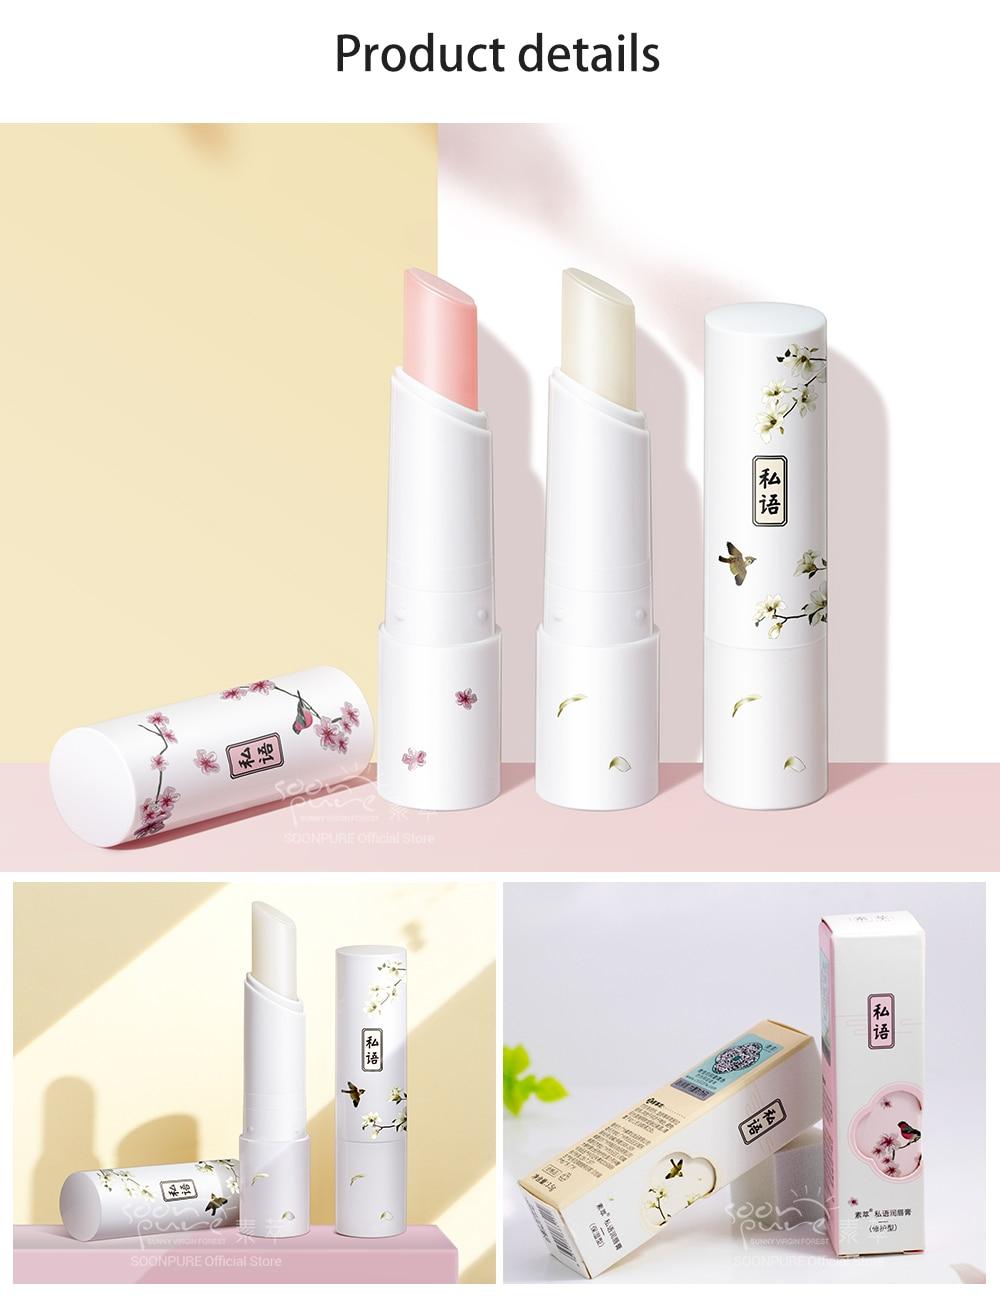 06SOONPURE Hyaluronic Acid Highly Nourishing Lip Balm And Moisturizing Lip Wrinkles Repairing Lipstick Lips Makeup Beauty Lip Care